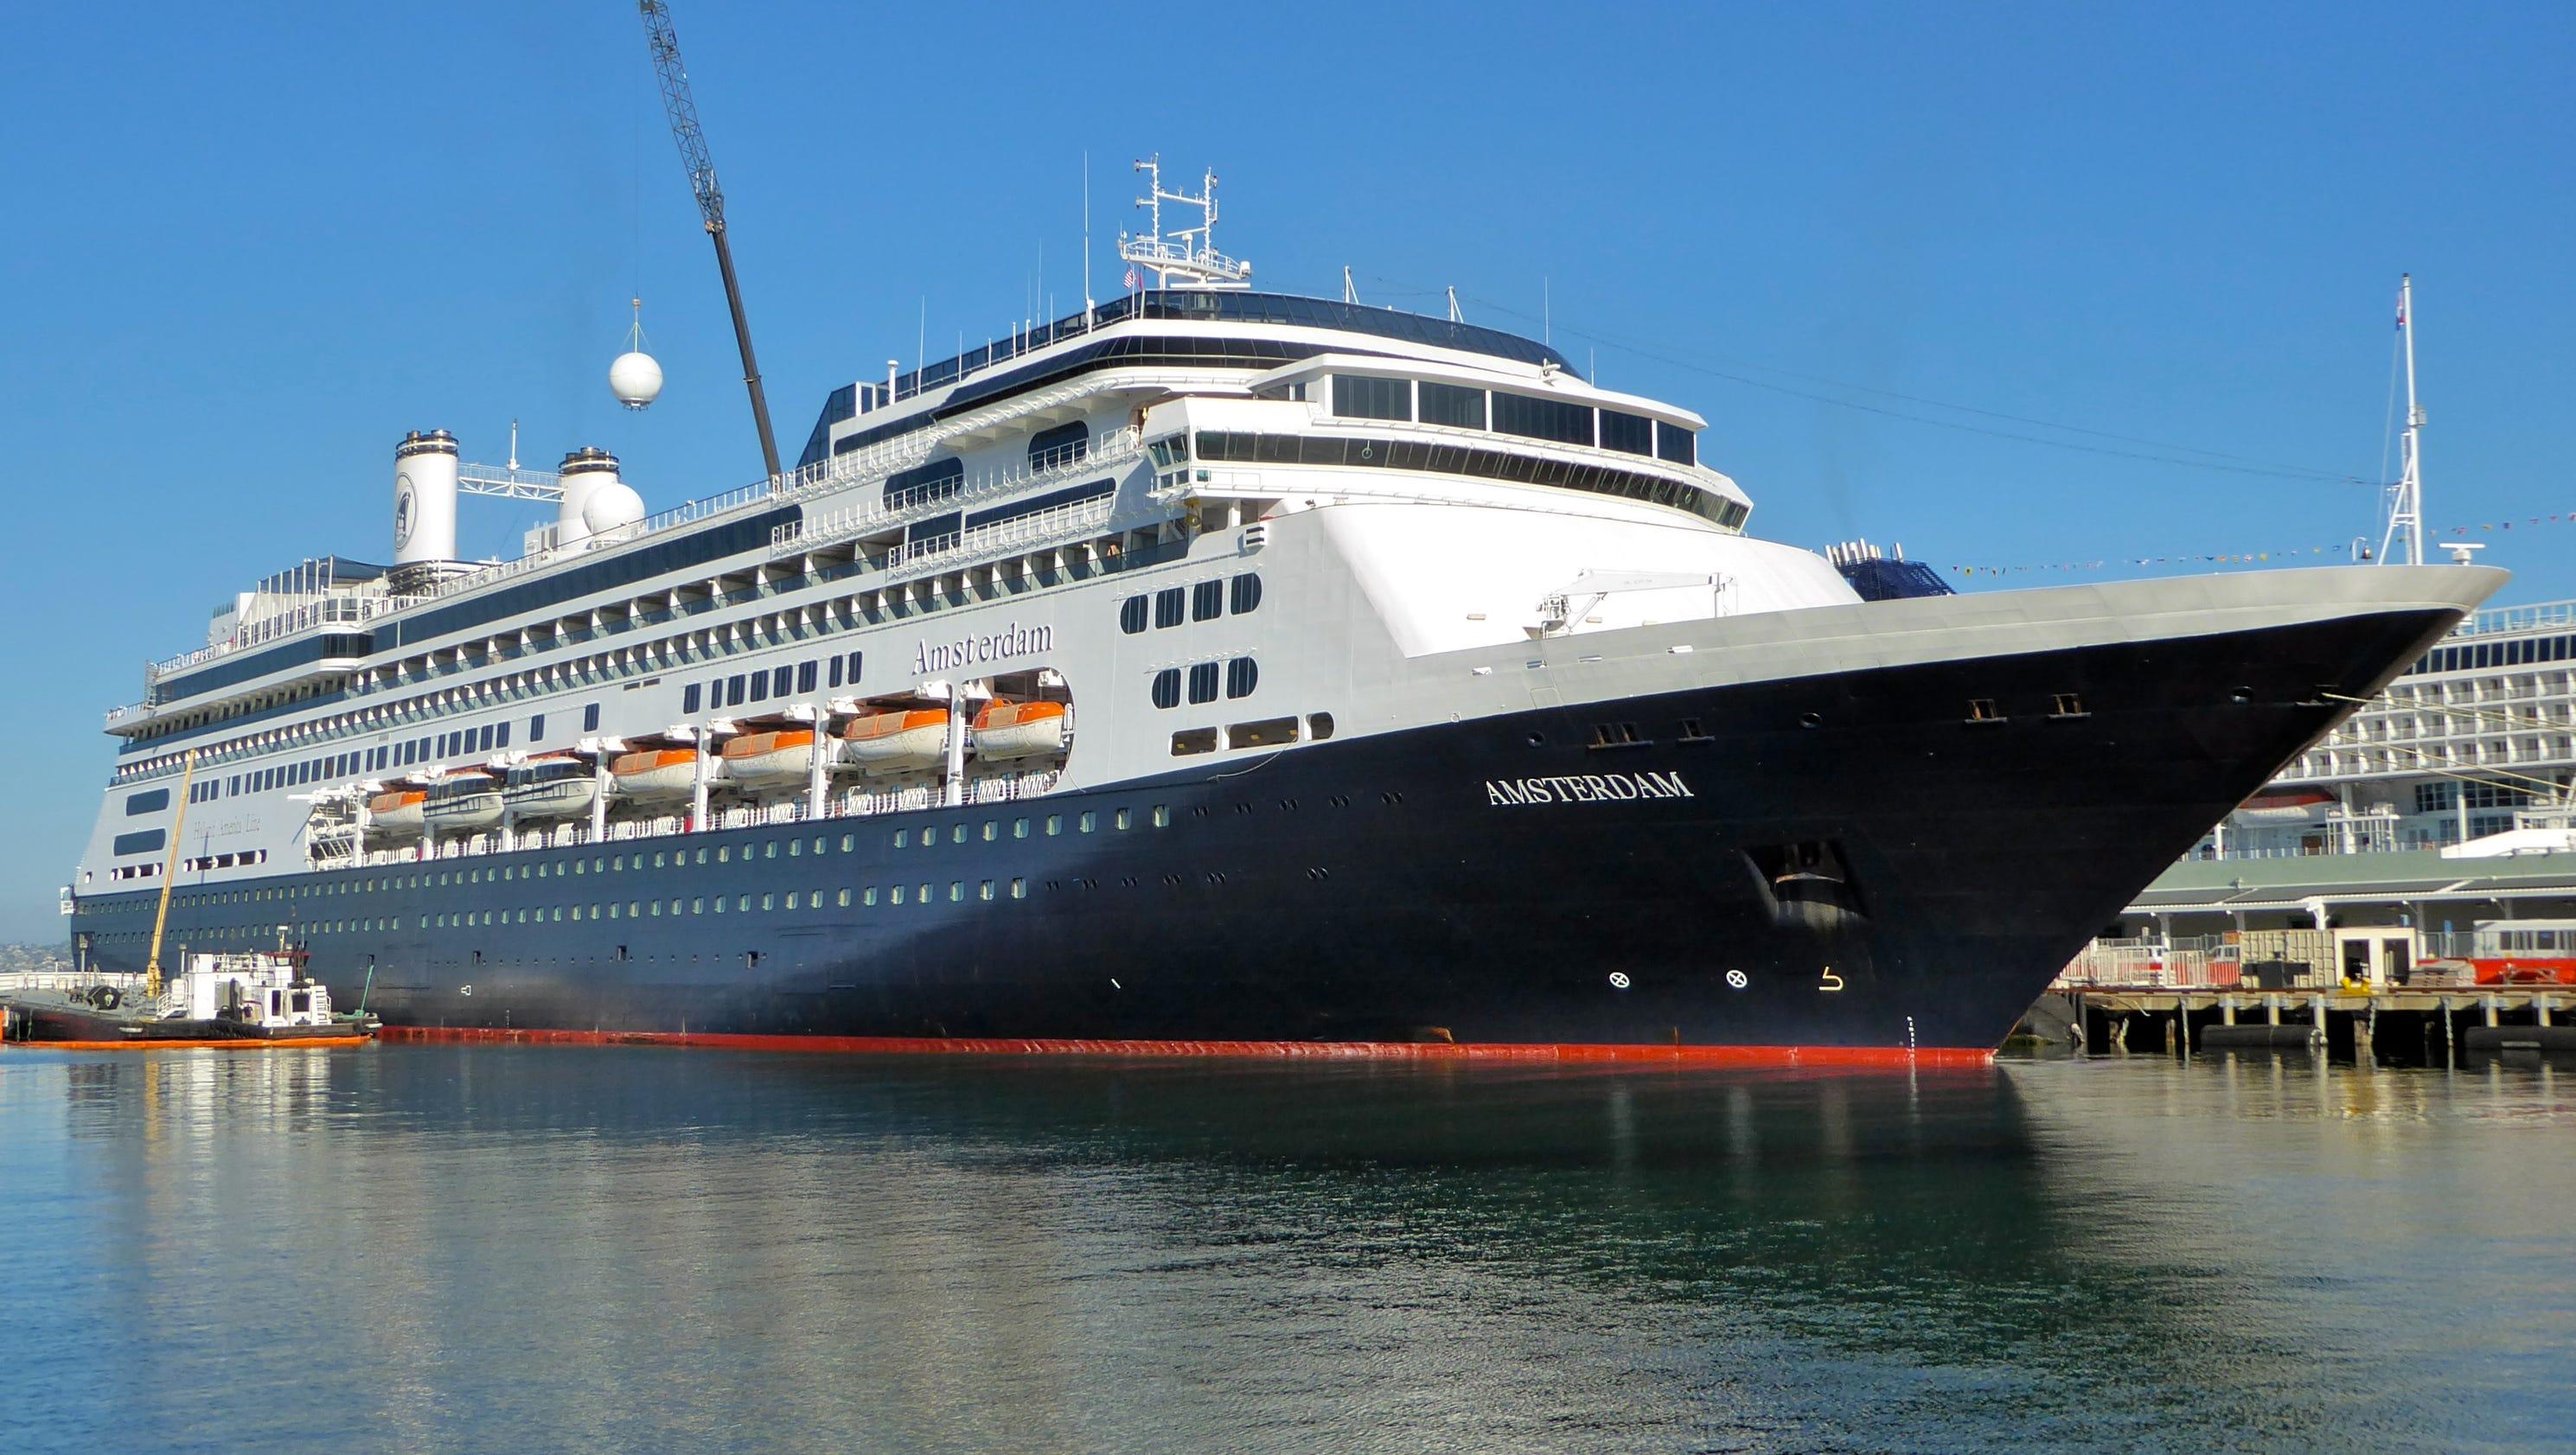 001 Amsterdam Cruise Ship Tours Holland America